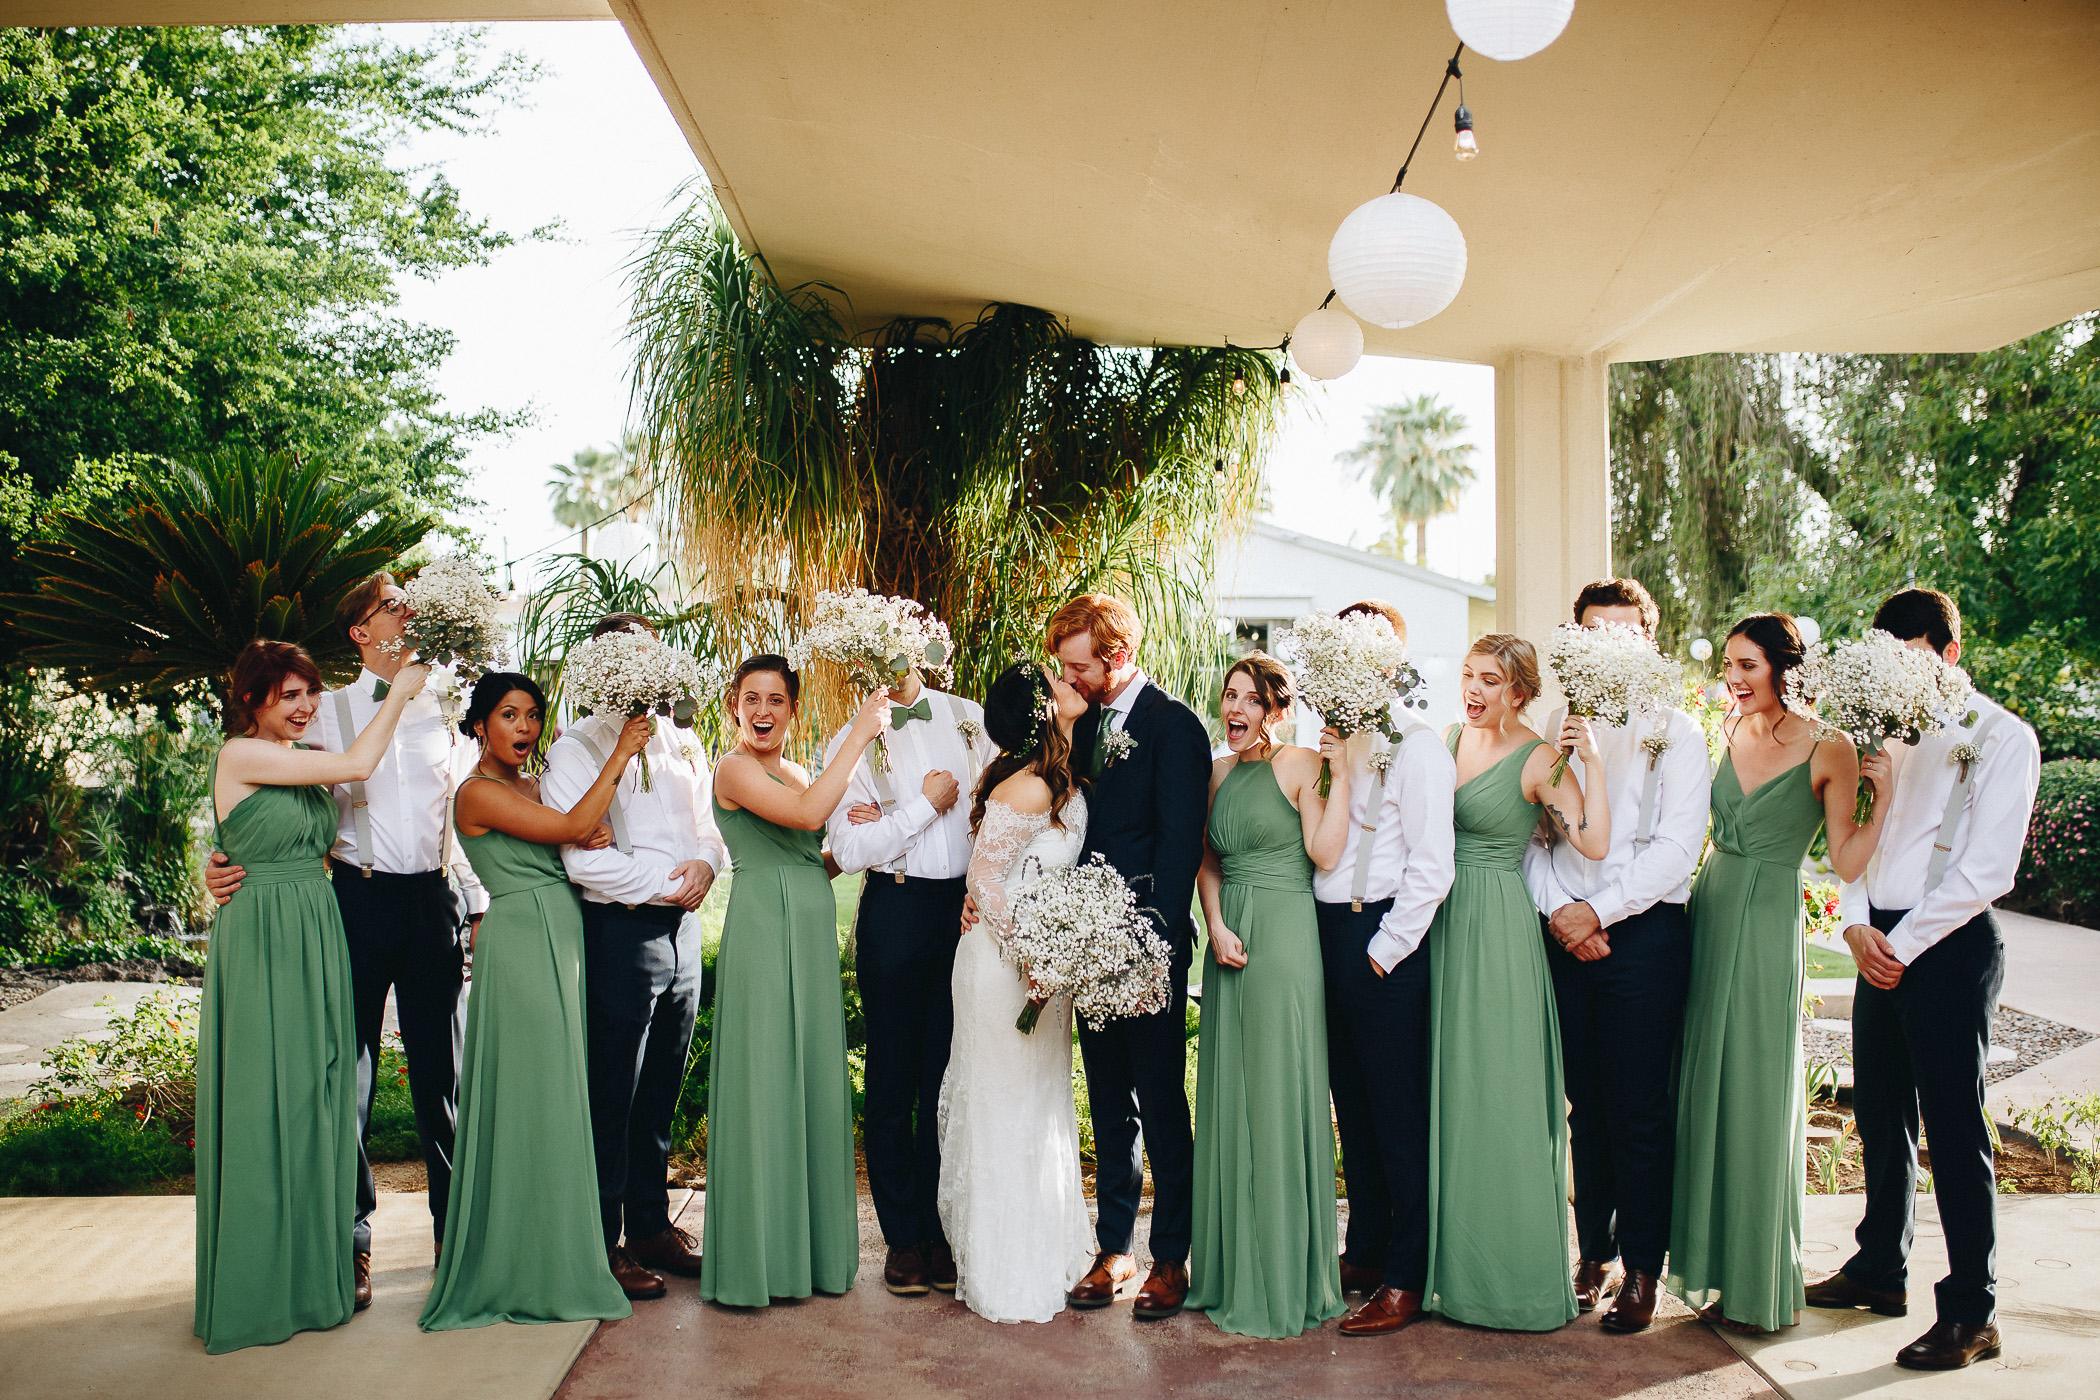 181104-Luxium-Weddings-Arizona-@matt__Le-Brandon-Kariana-Phoenix-Valley-Garden-Center-1093.jpg